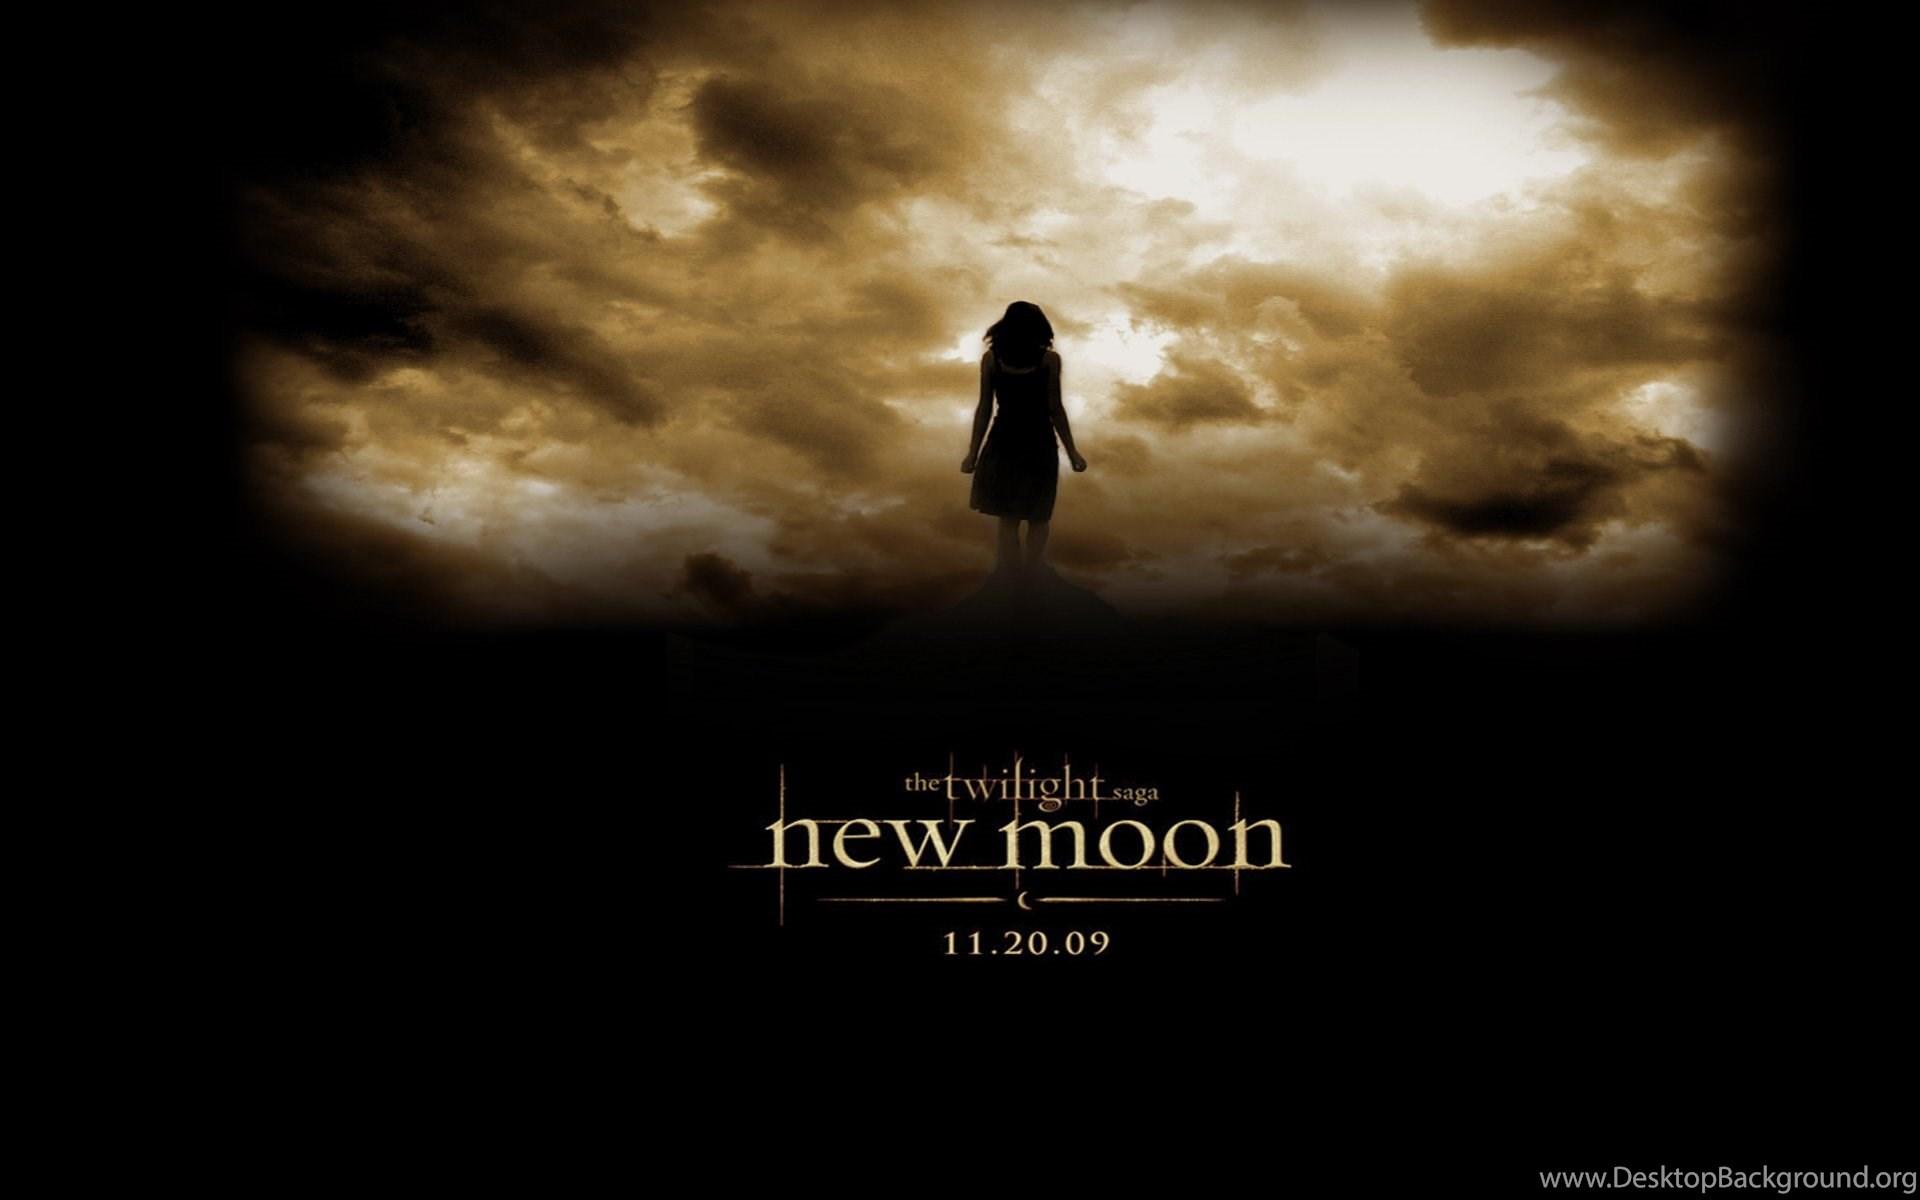 the twilight saga new moon hd wallpapers desktop background